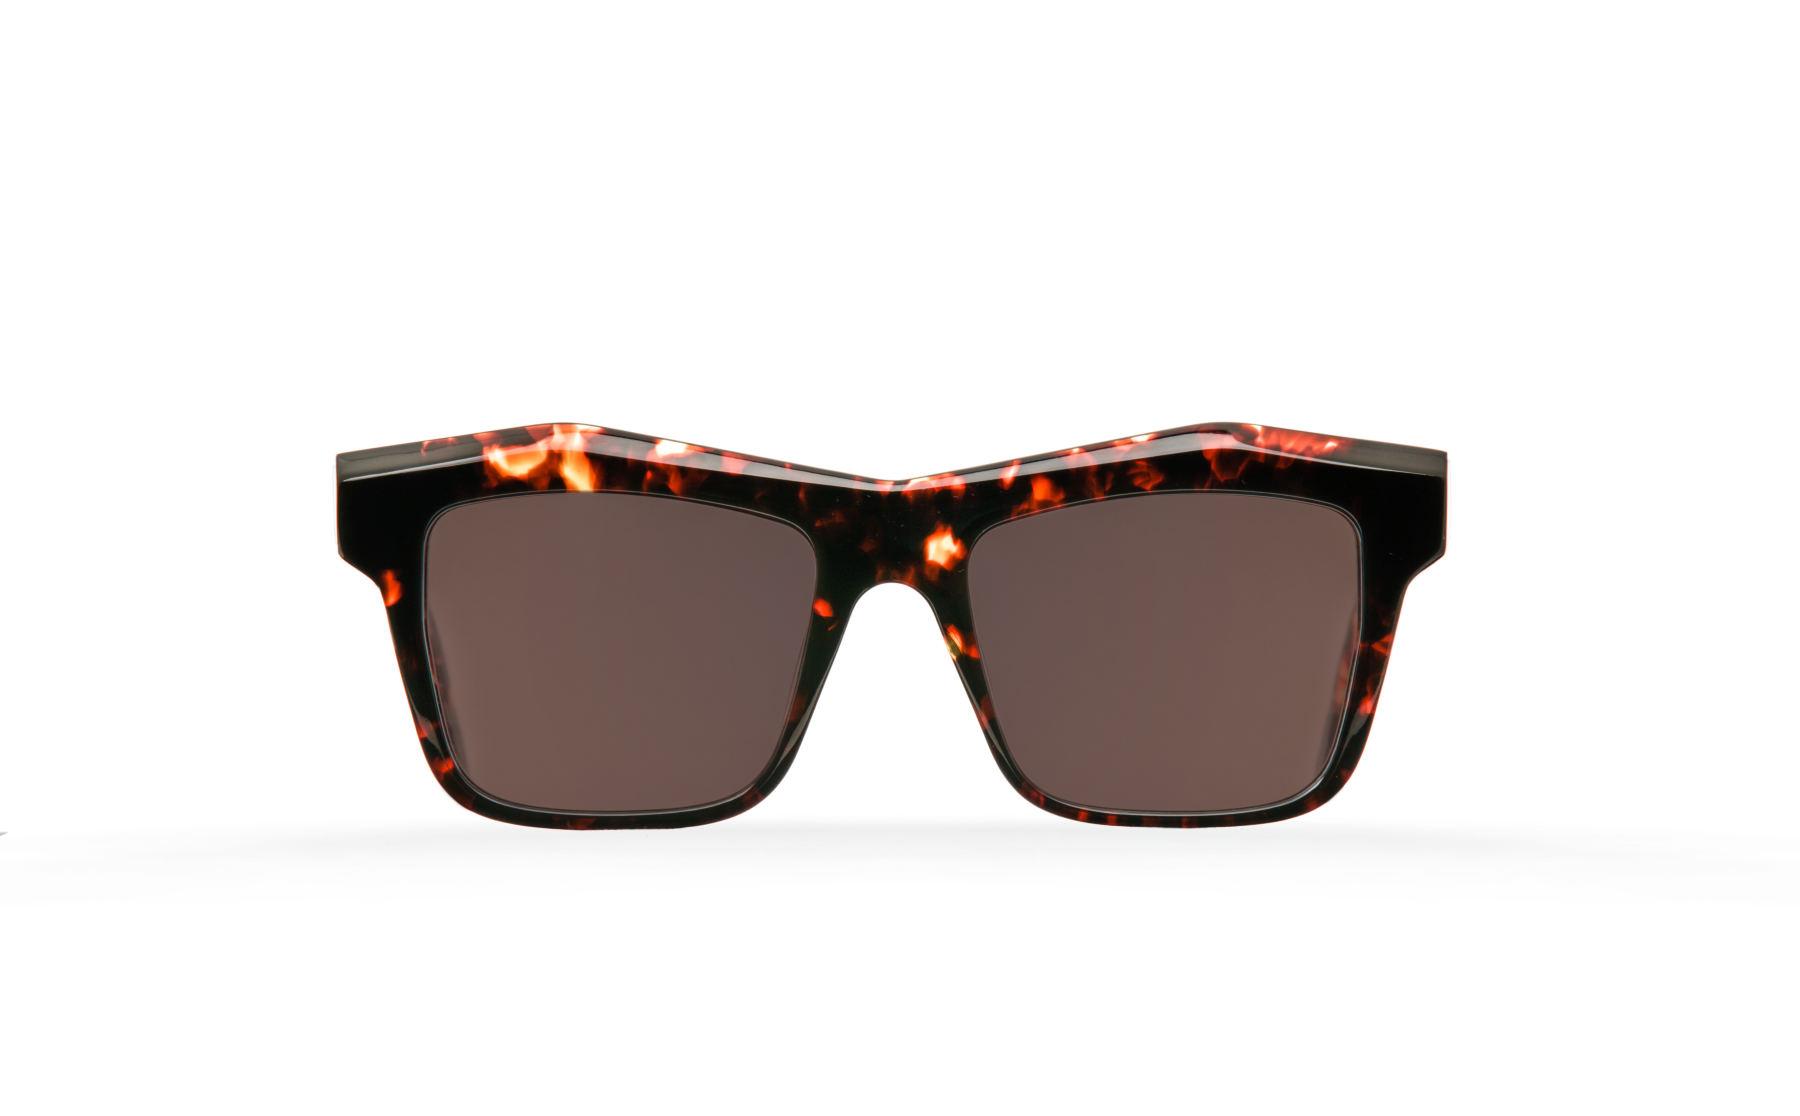 FAKBYFAK  Fakfarer Model 2. Sun. Burning Sycamore Havana Code: FBF-19-02-14